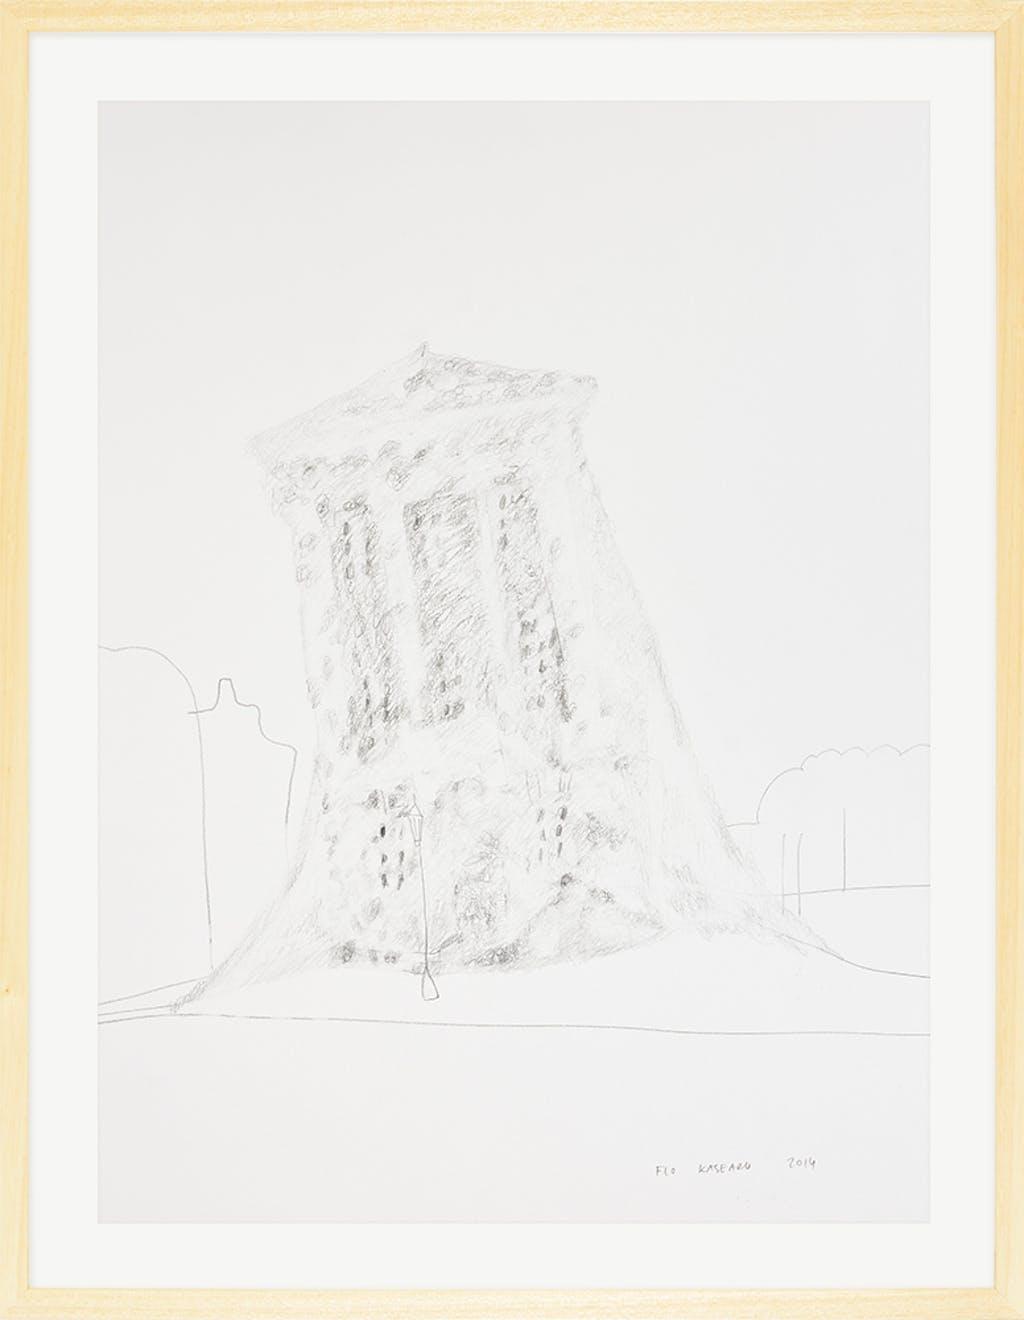 Fears Of A Museum Director - © Paris Internationale